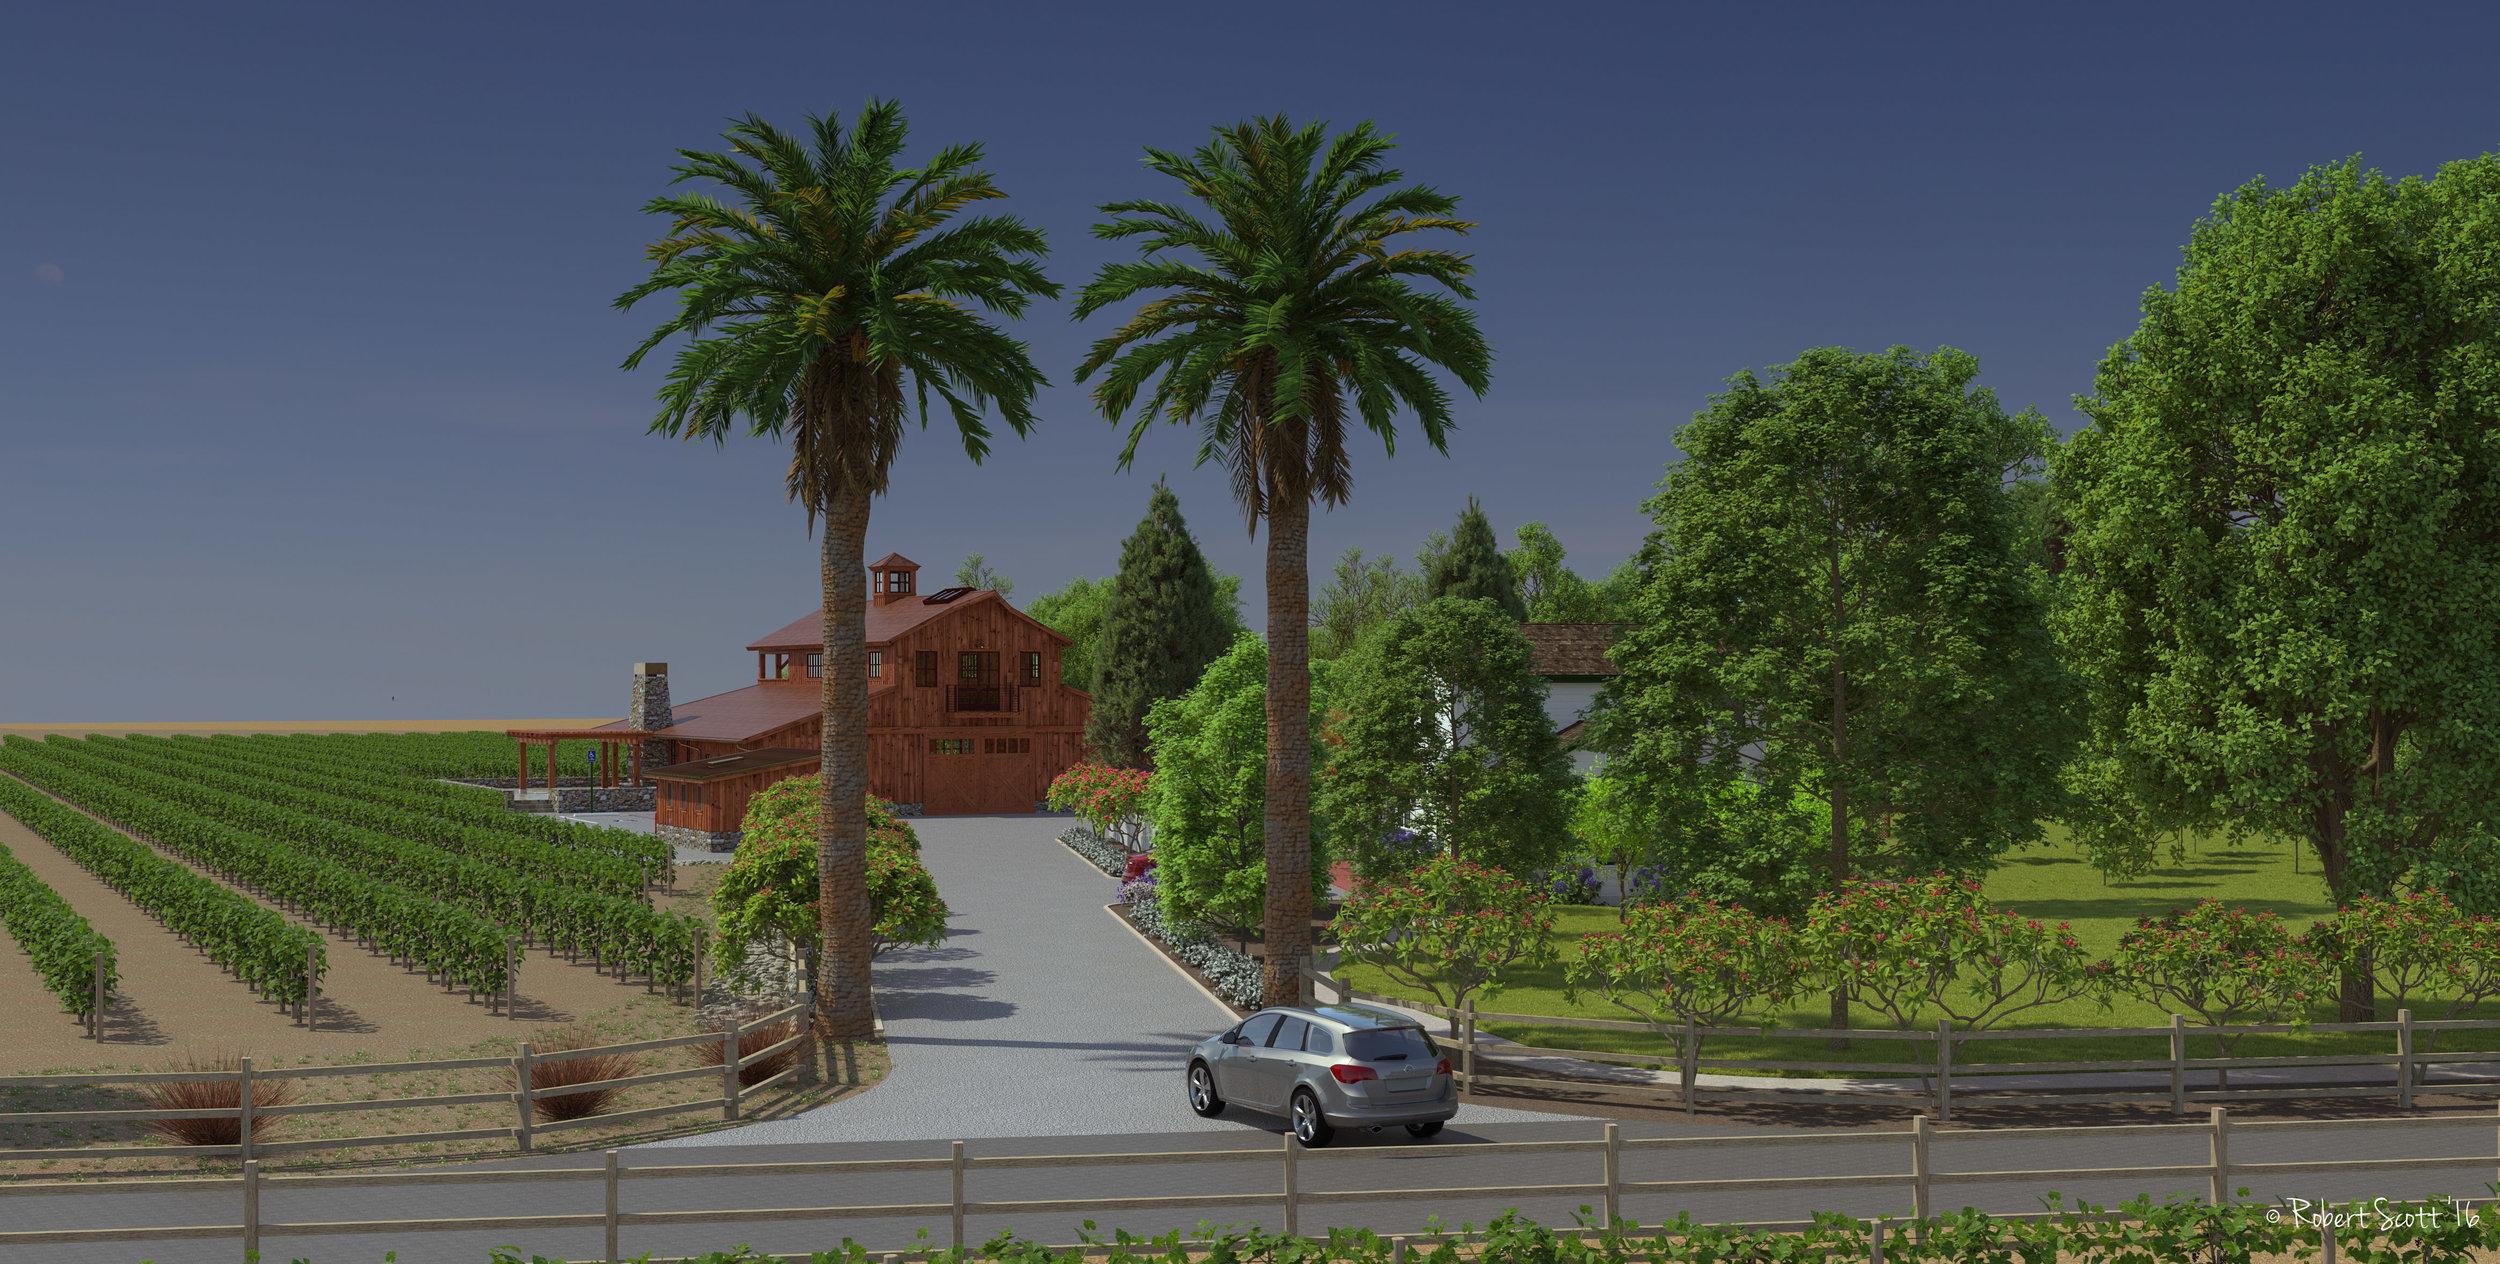 pka_nickel-winery_site_13may16-scene-4_27044385075_o.jpg